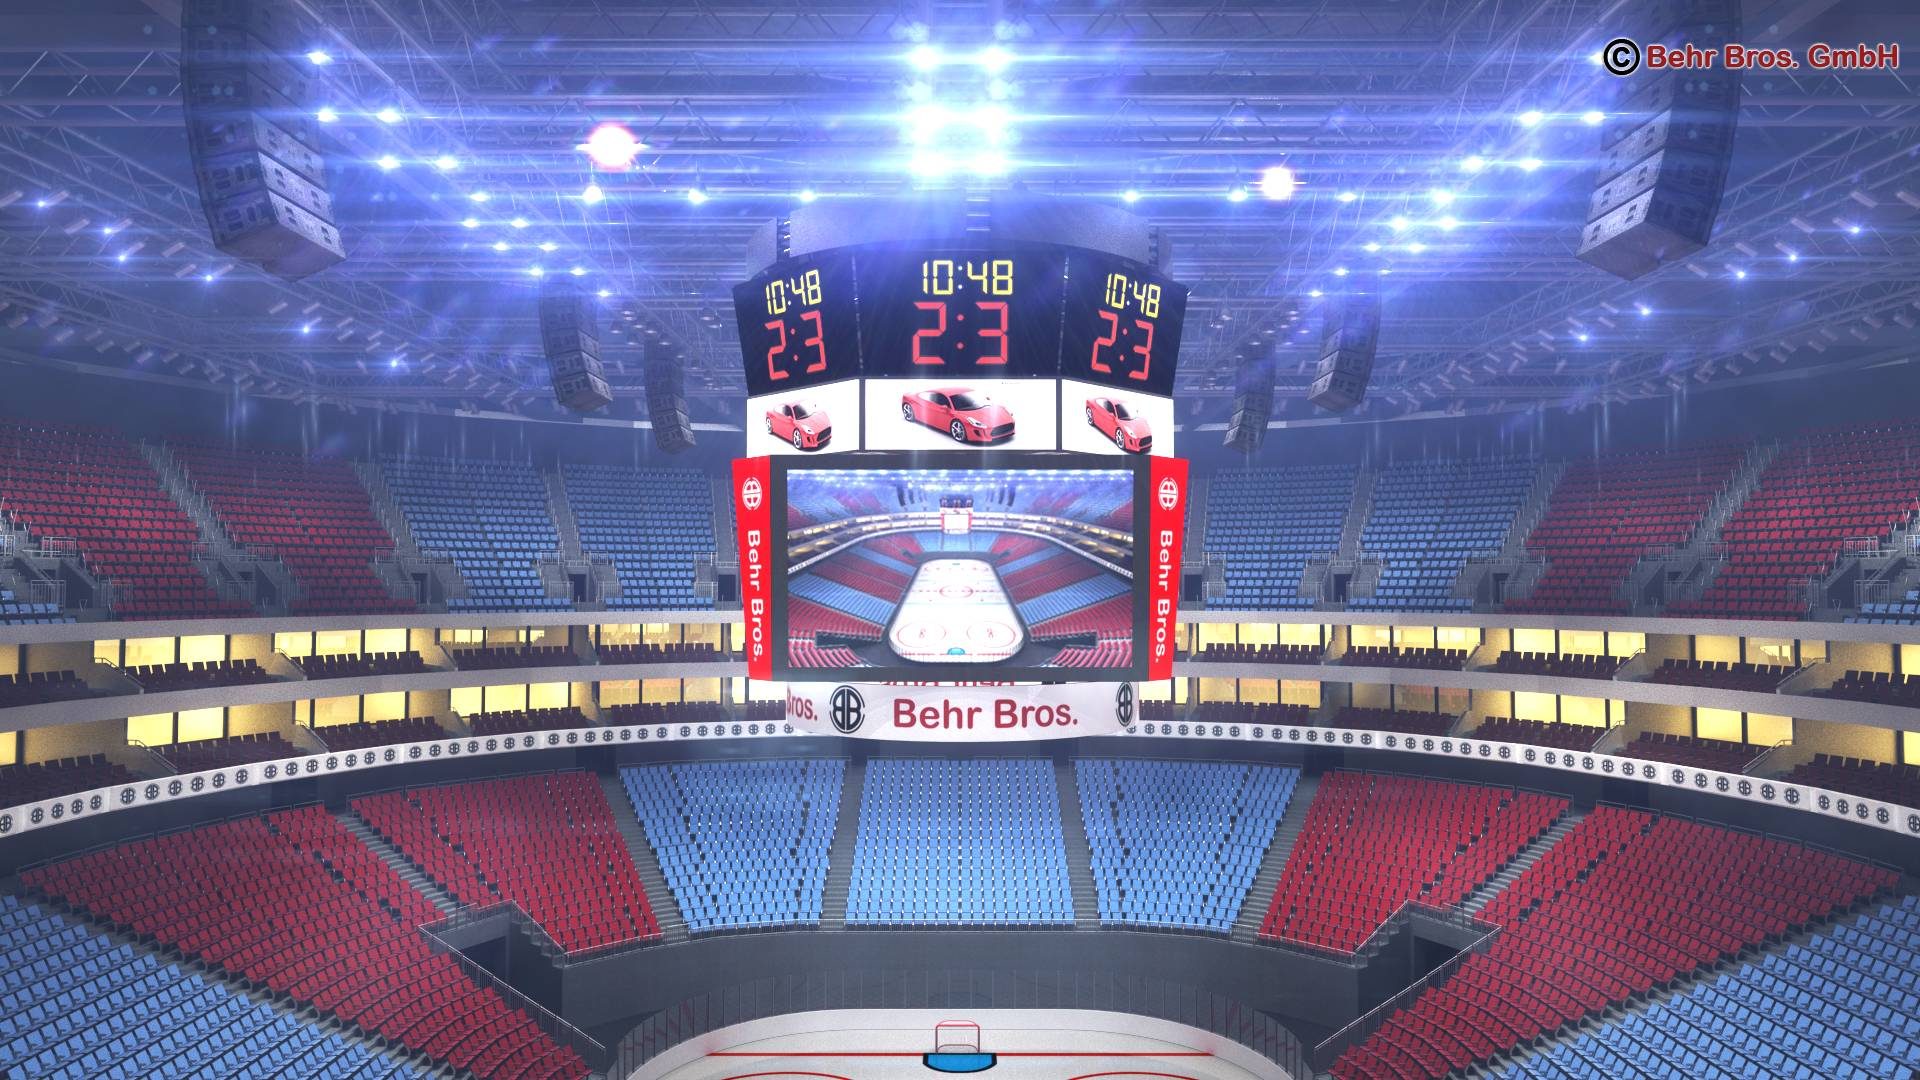 ice hockey arena v2 3d model 3ds max fbx c4d lwo ma mb obj 251655